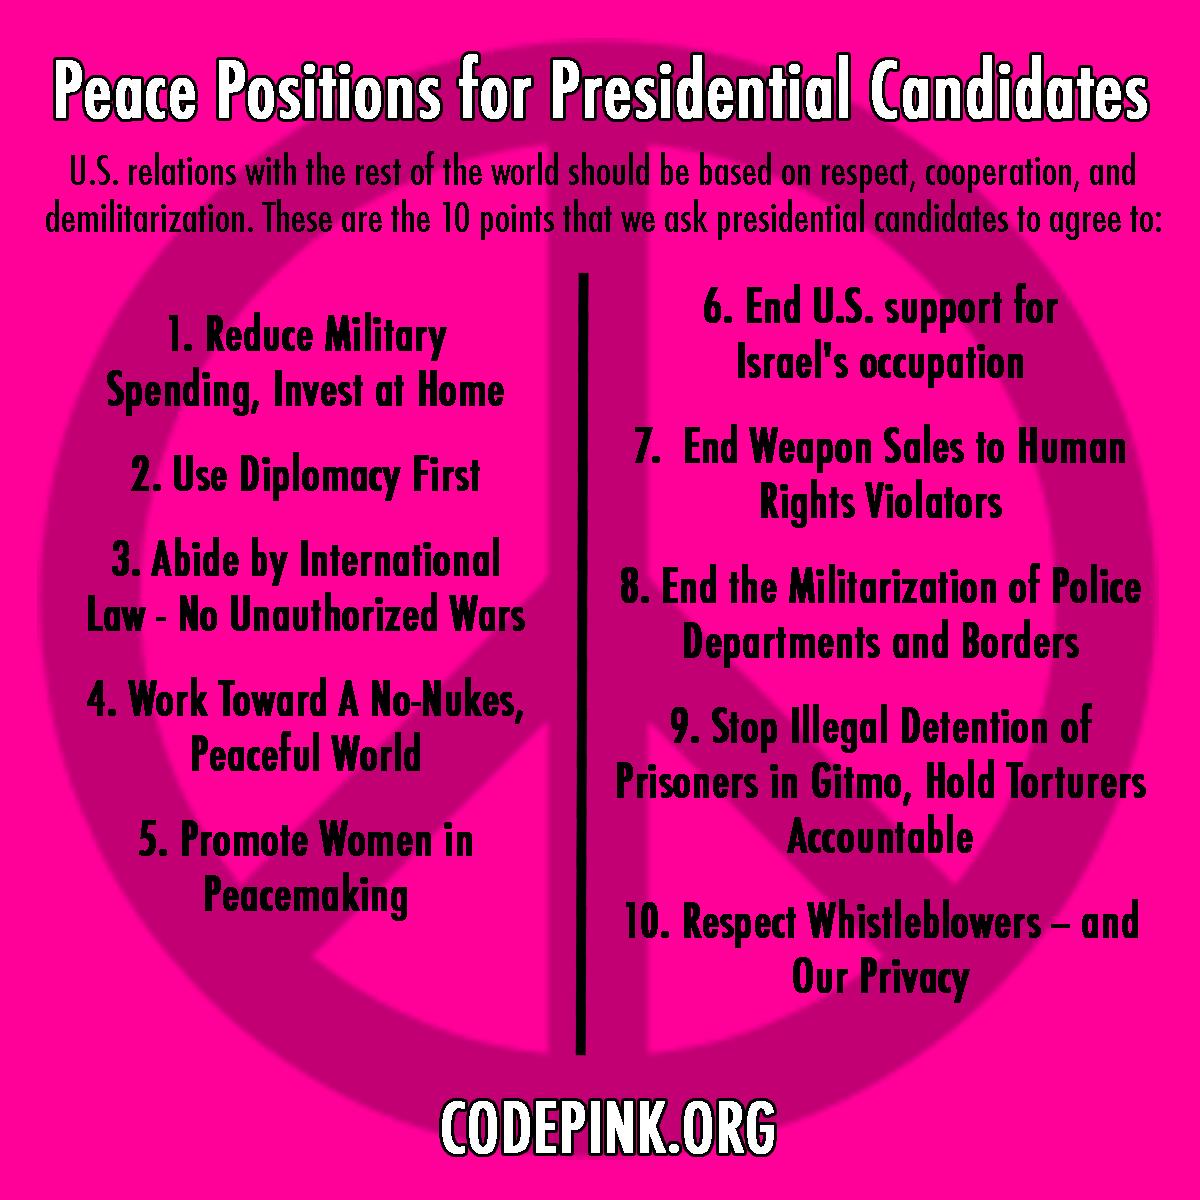 PeacePresidentSquare.png